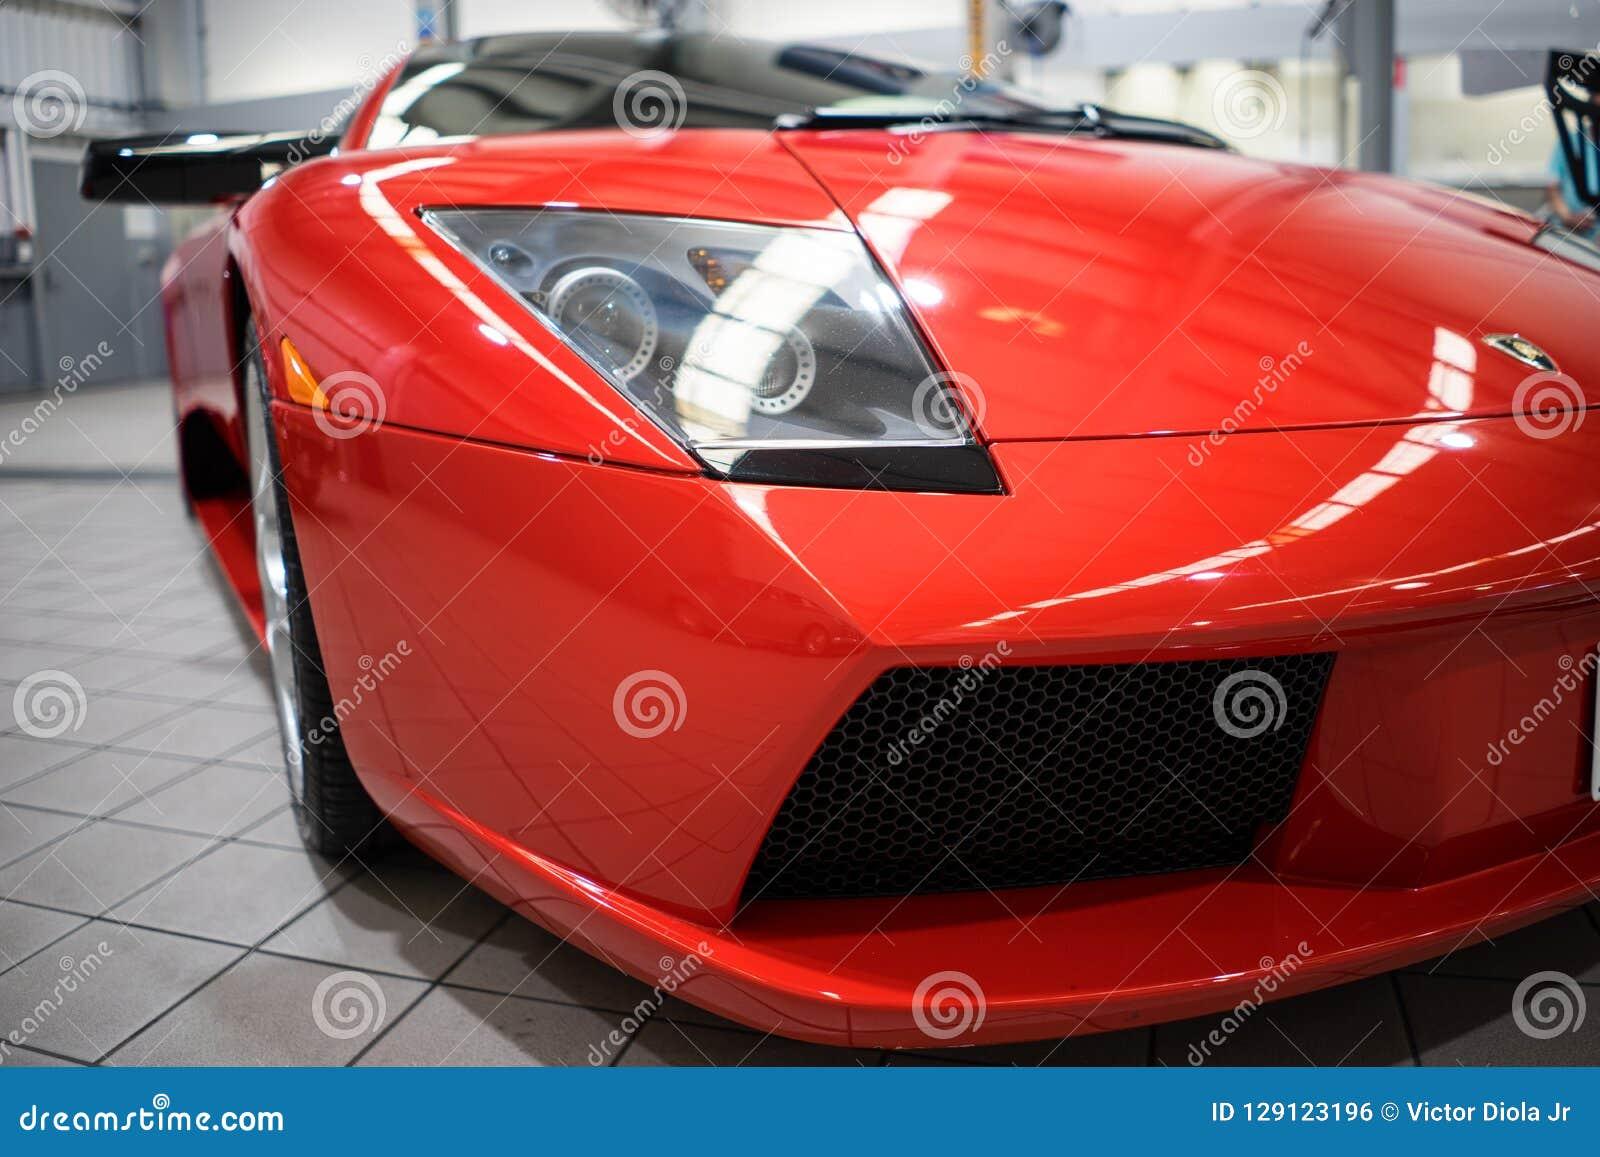 Lamborghini Mucielago Closeup Front Editorial Photo Image Of Grill